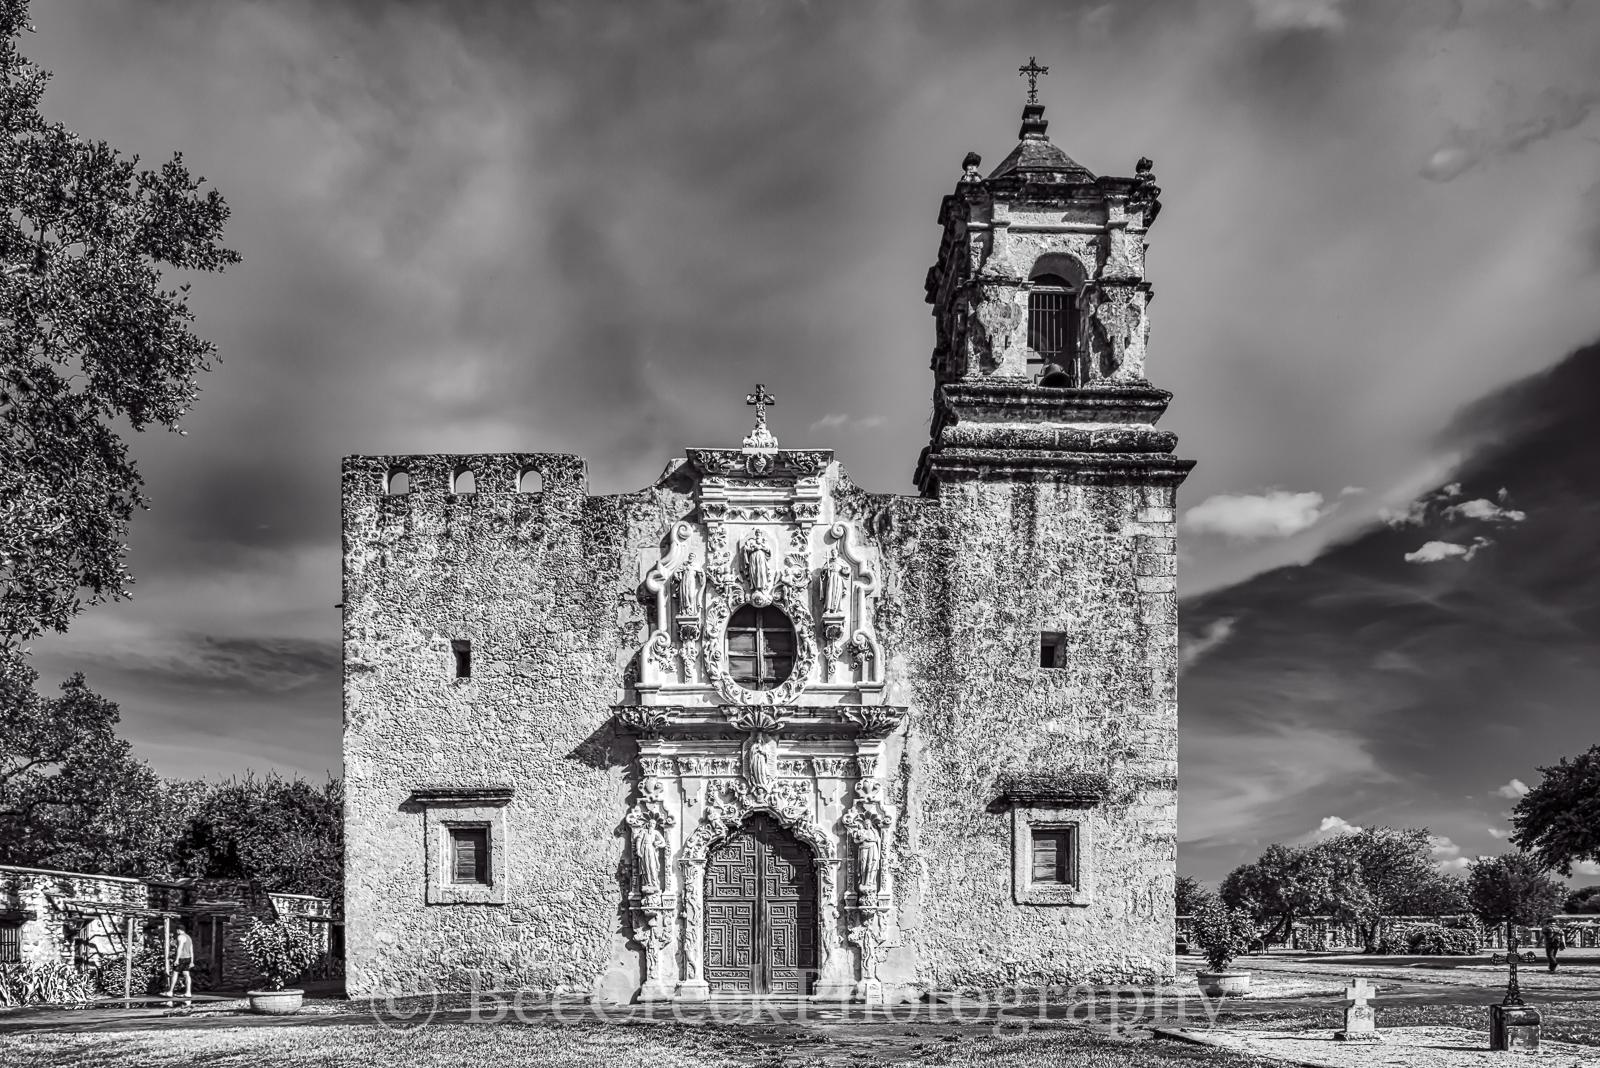 Mission San Jose, National Historic Landmarks, San Antonio, black and white, color, destinations, downtown, historic, indians, landmark, mexicans, spanish missions, texas missions, texians, tourist, t, photo